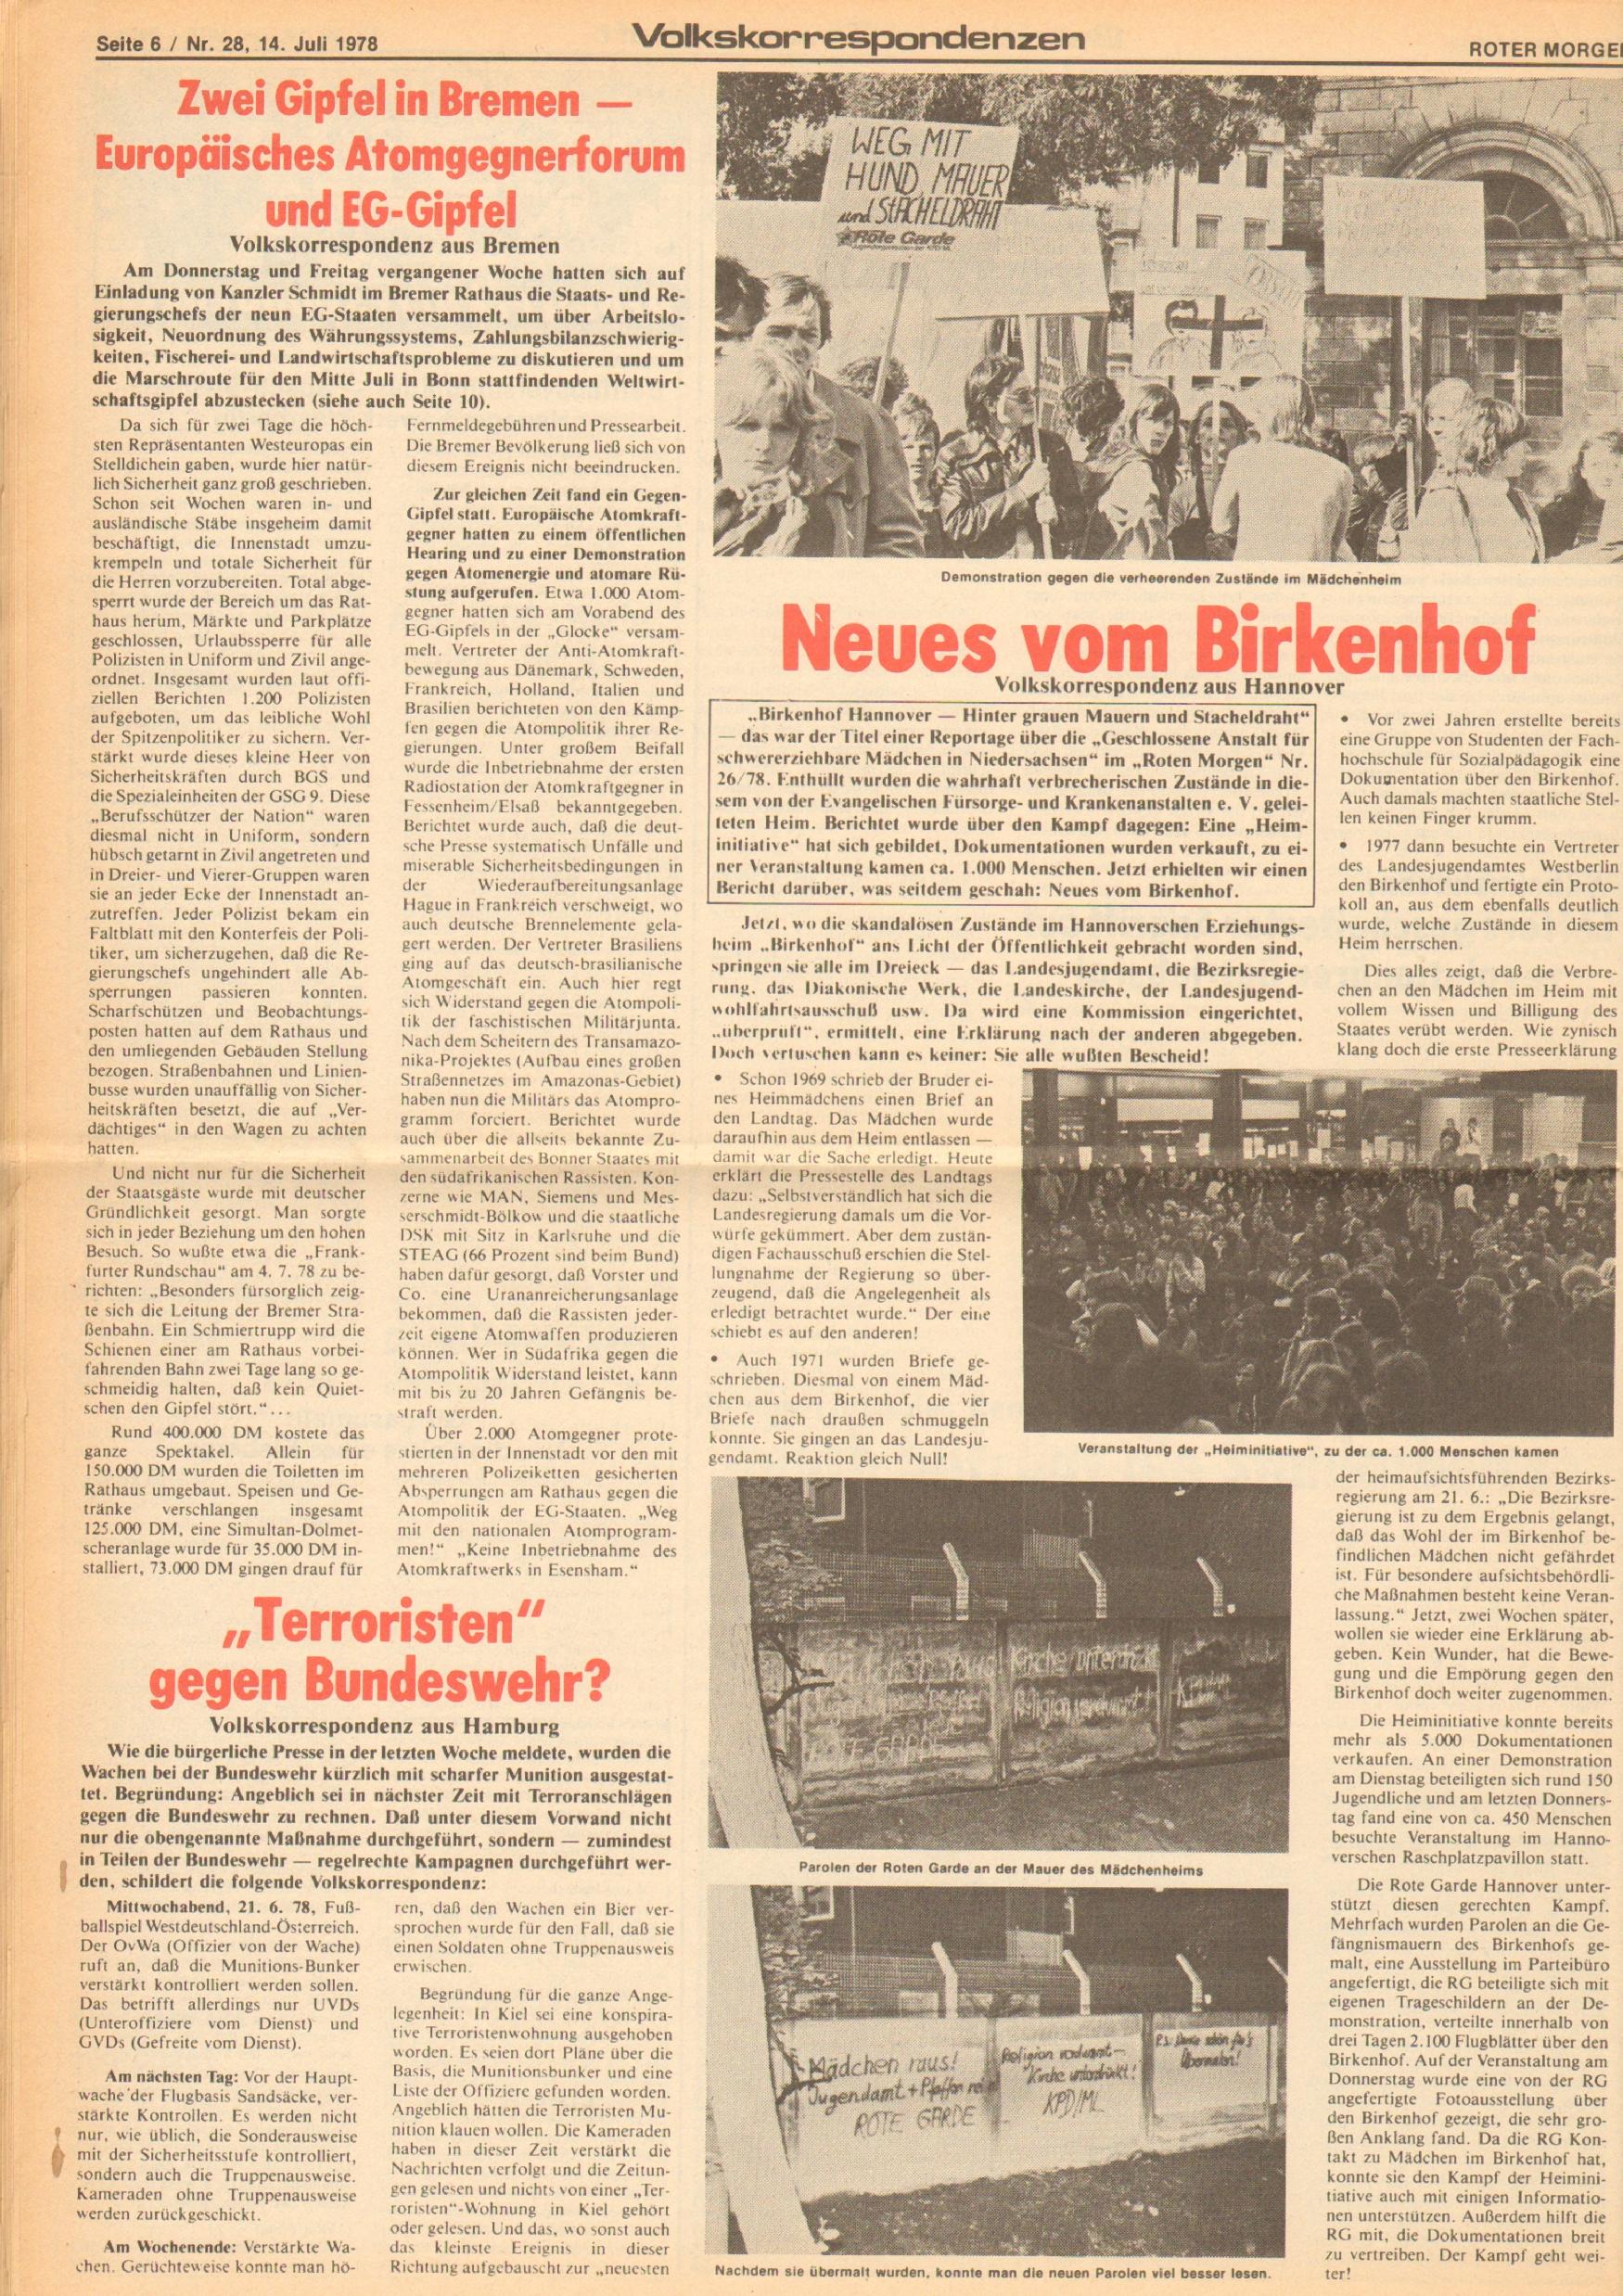 Roter Morgen, 12. Jg., 16. Juli 1978, Nr. 28, Seite 6